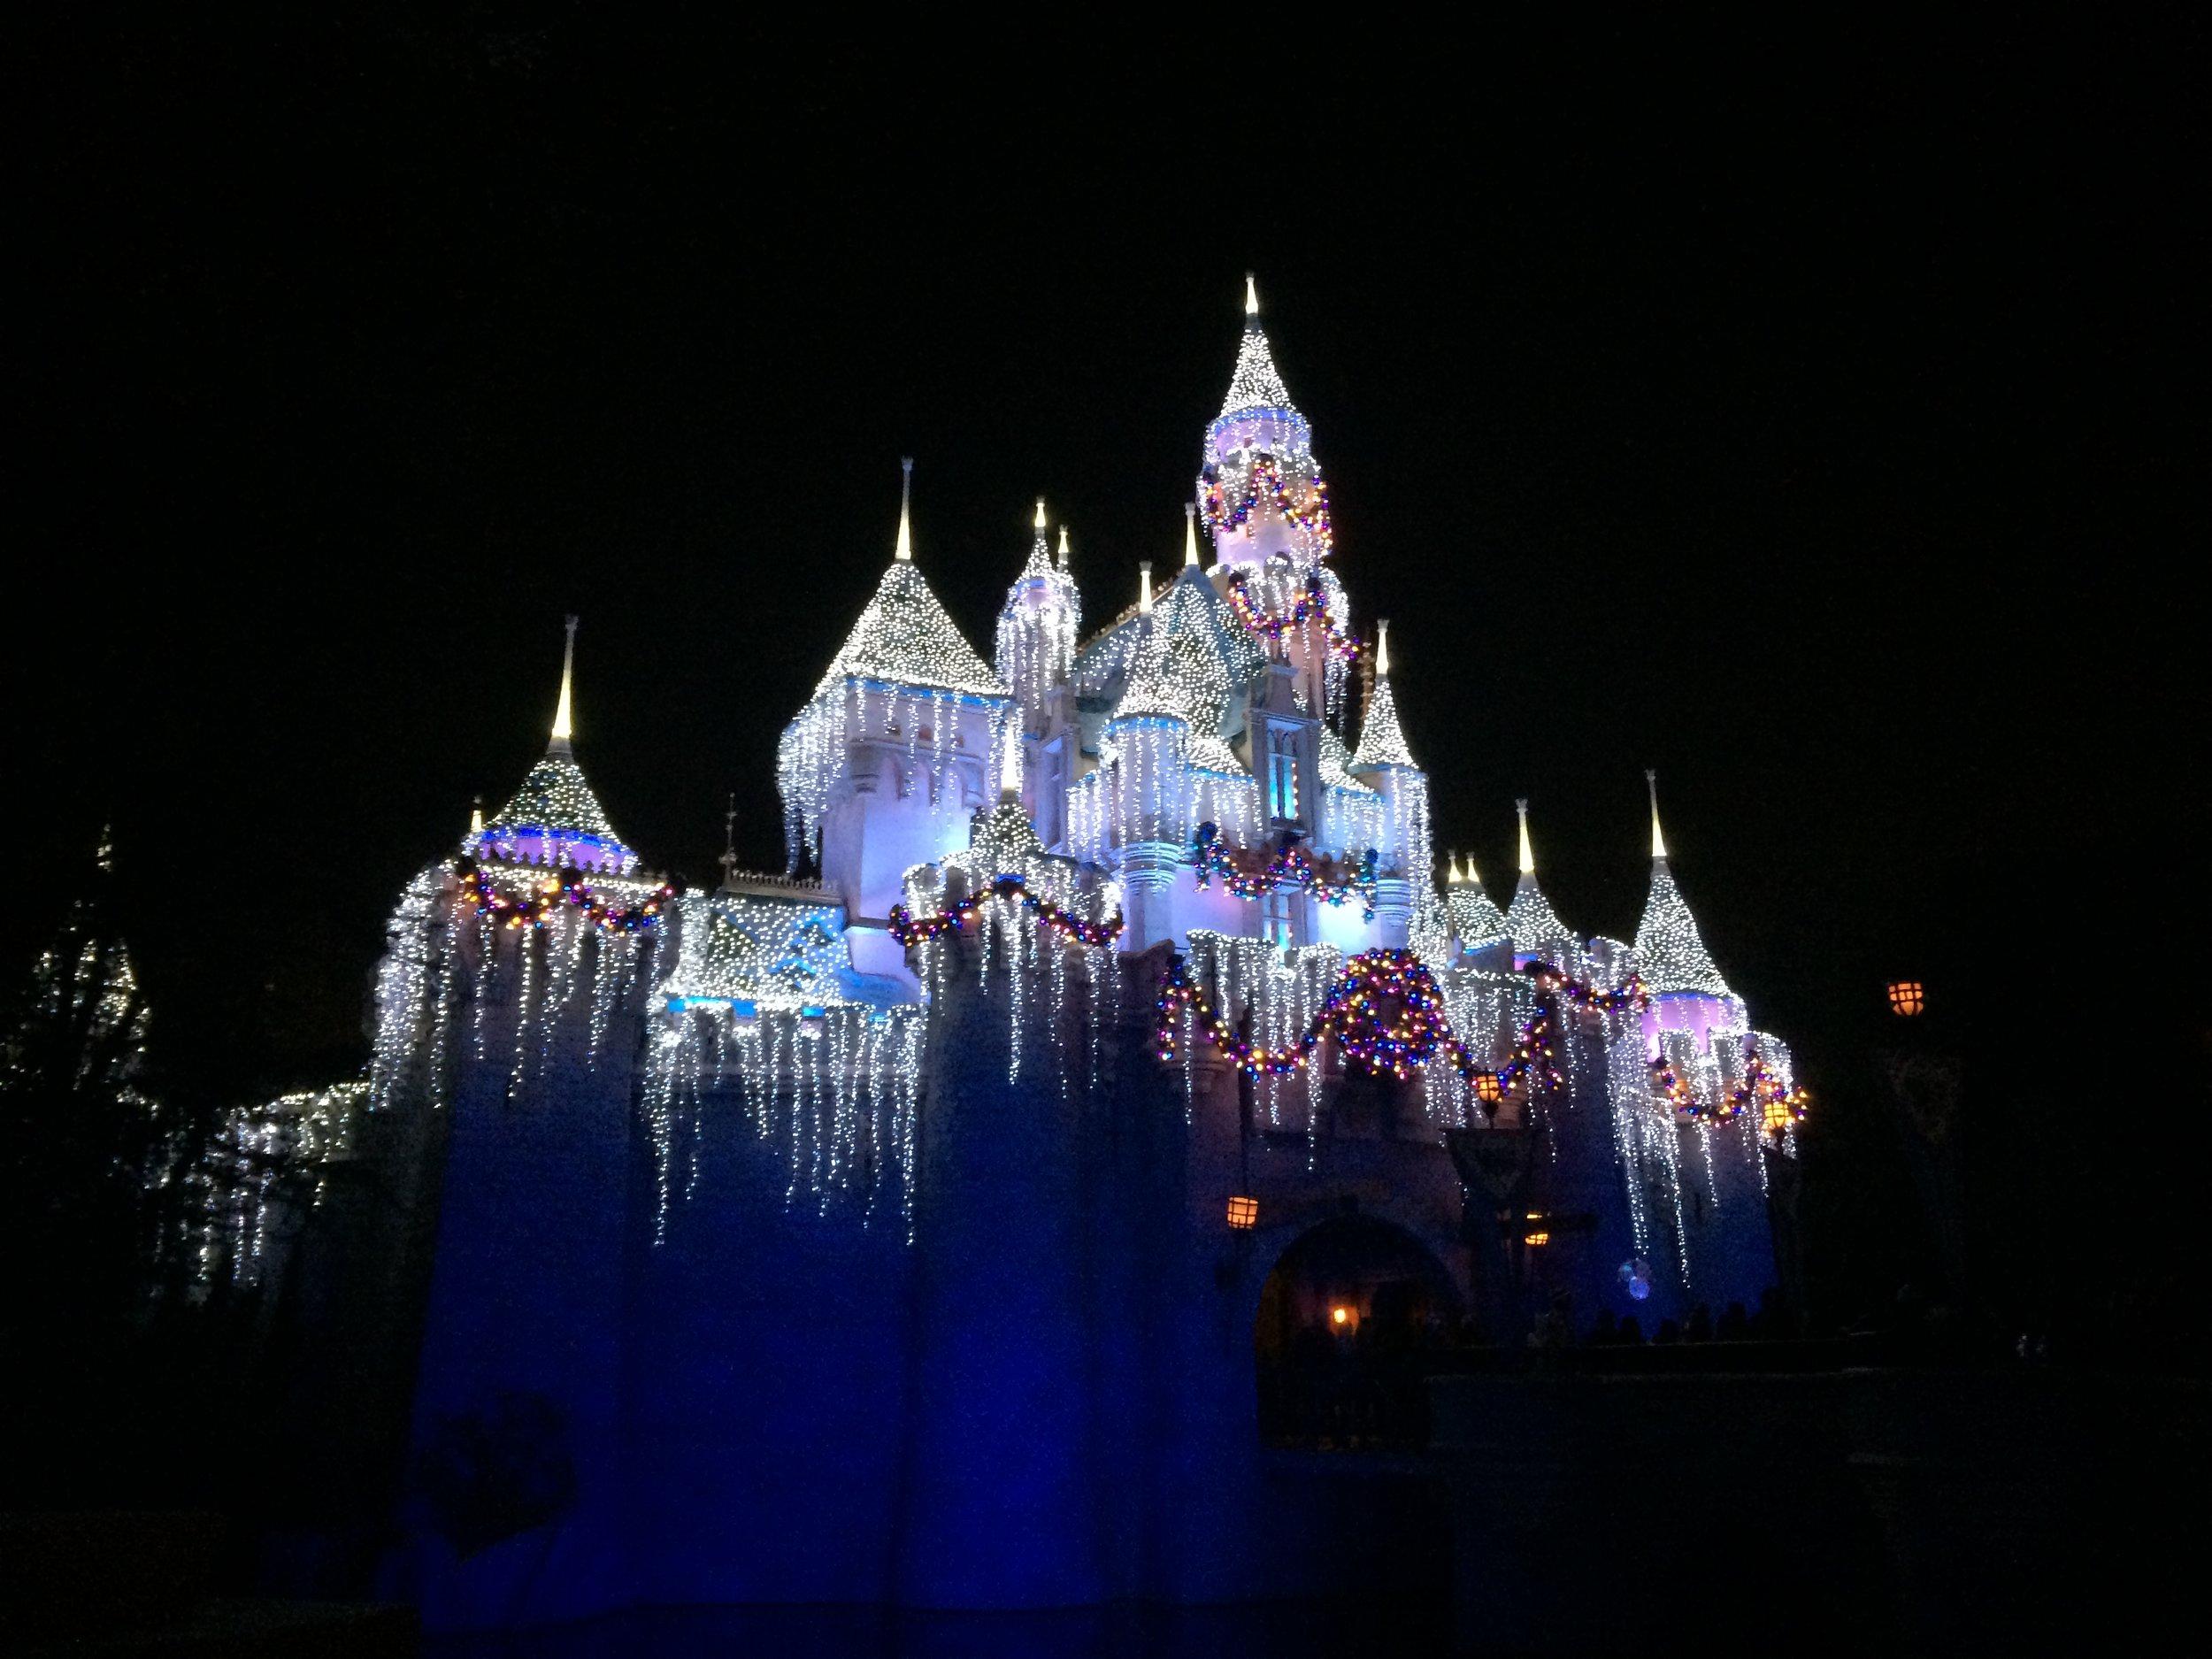 sleeping beauty castle holiday christmas night